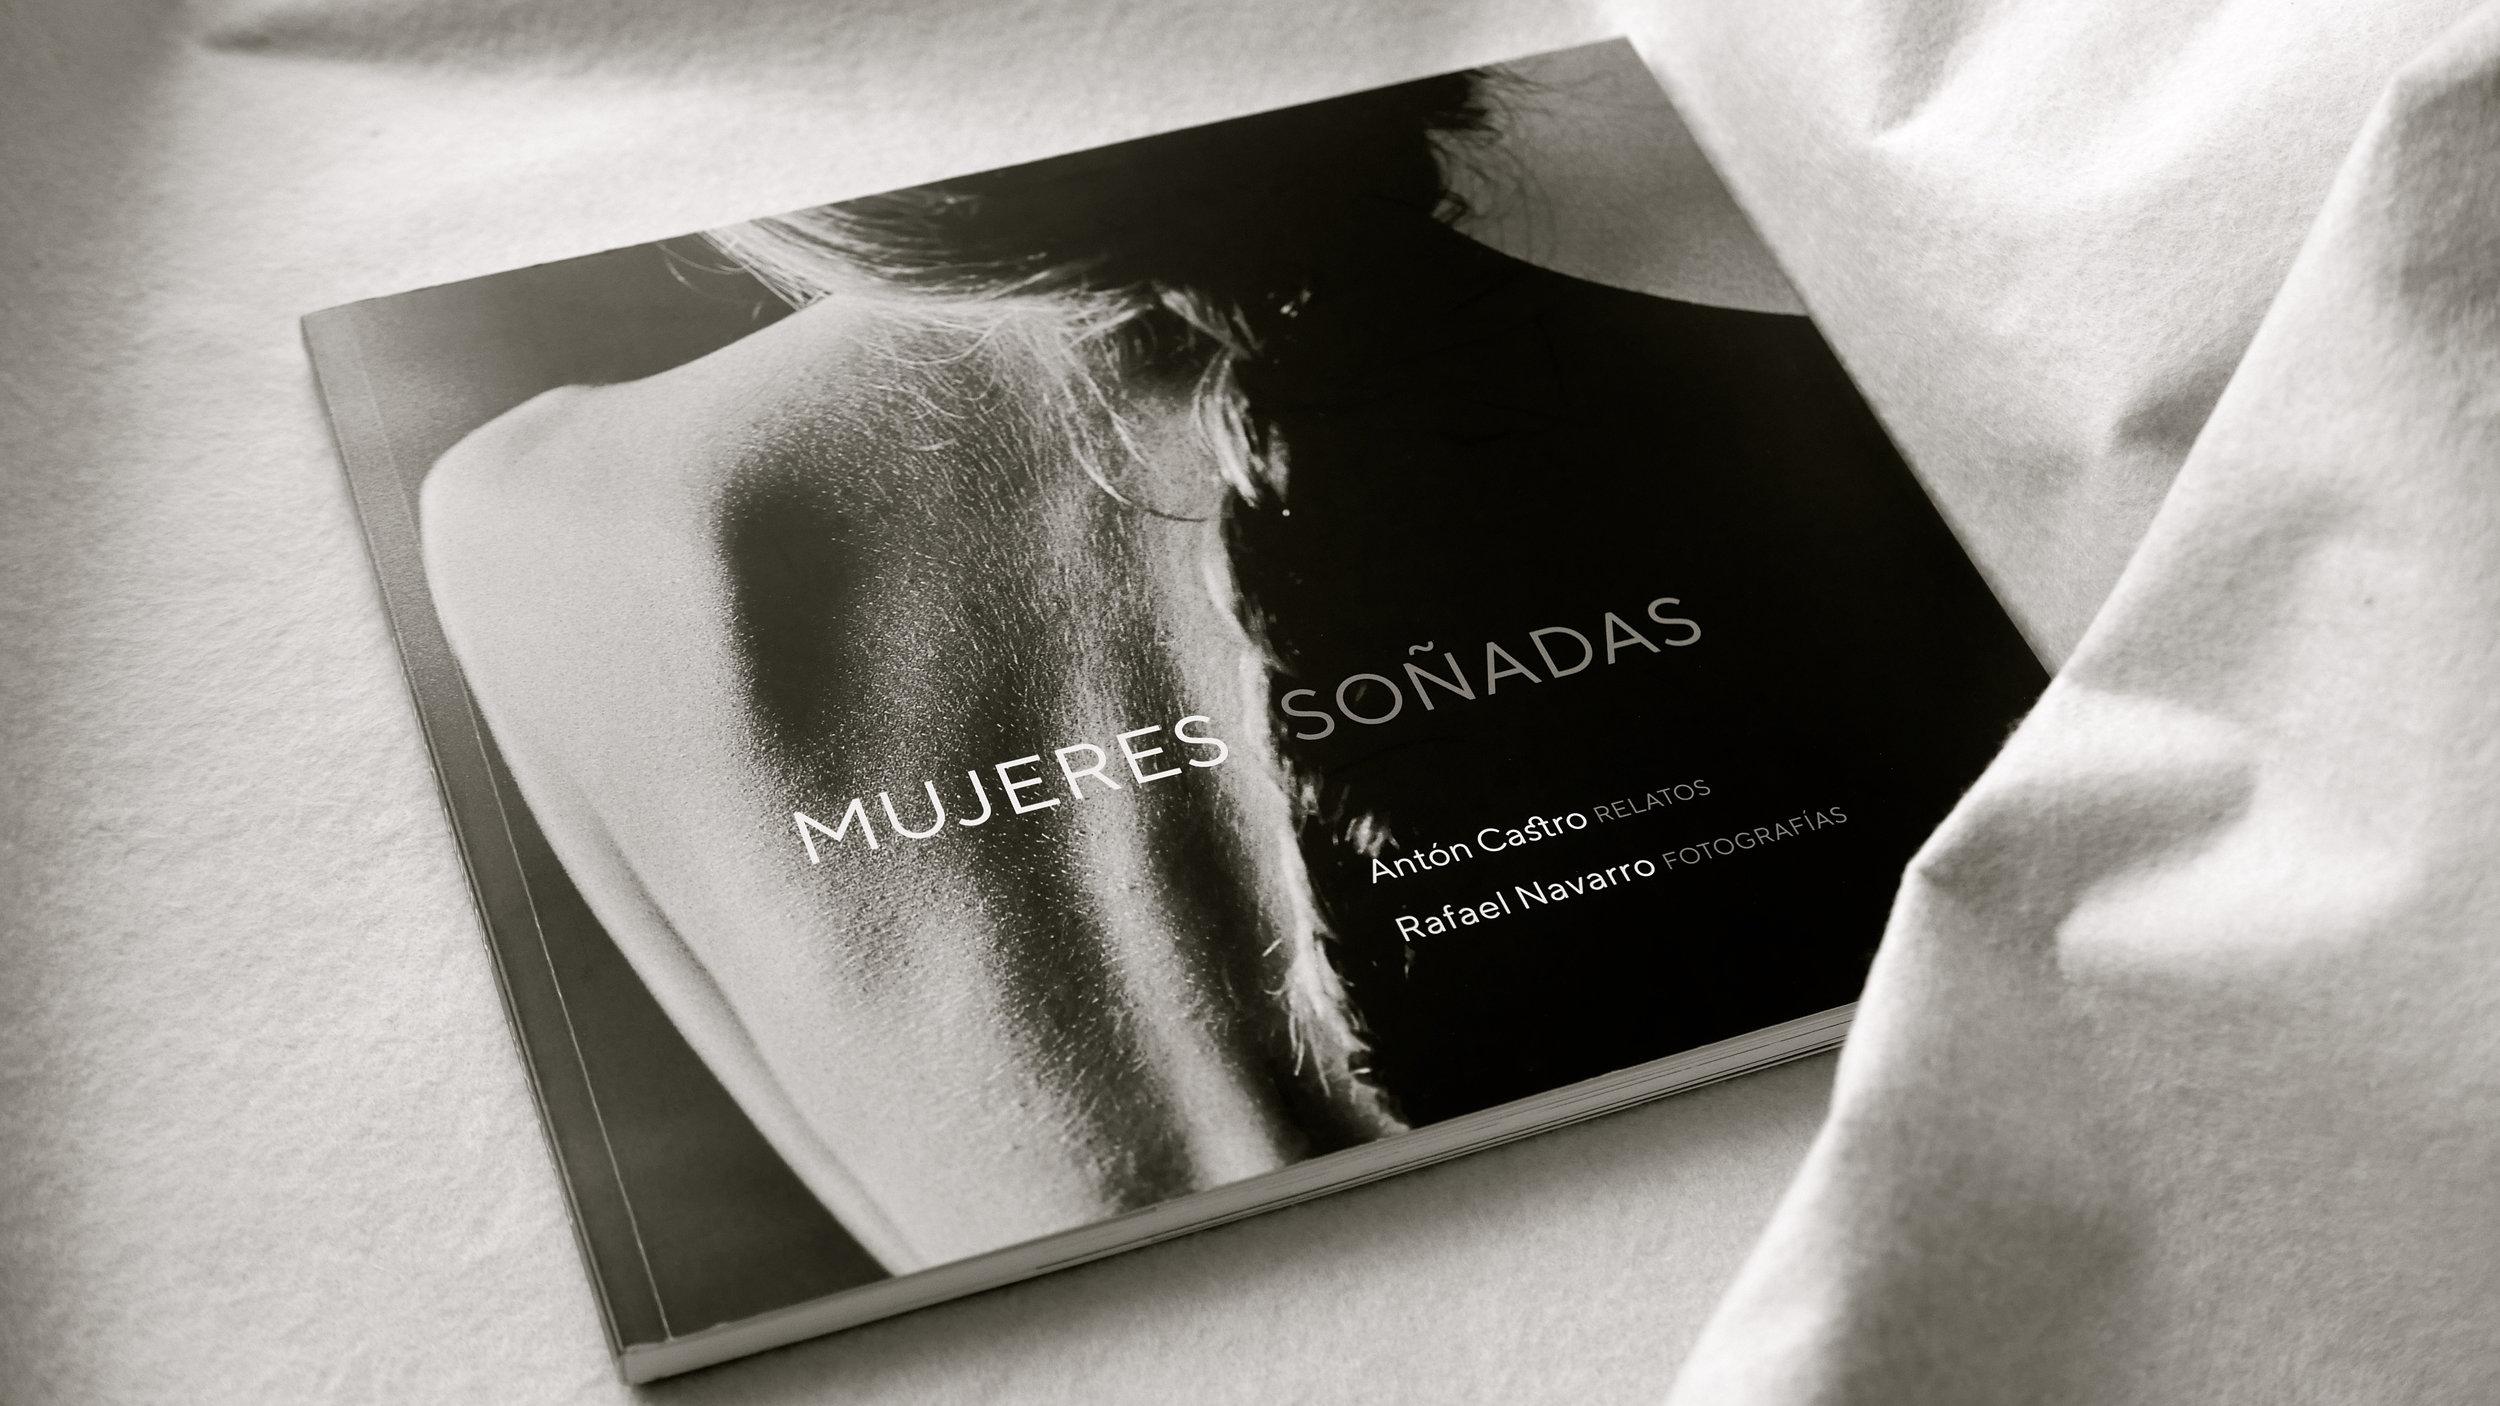 Mujeres soñadas - 03